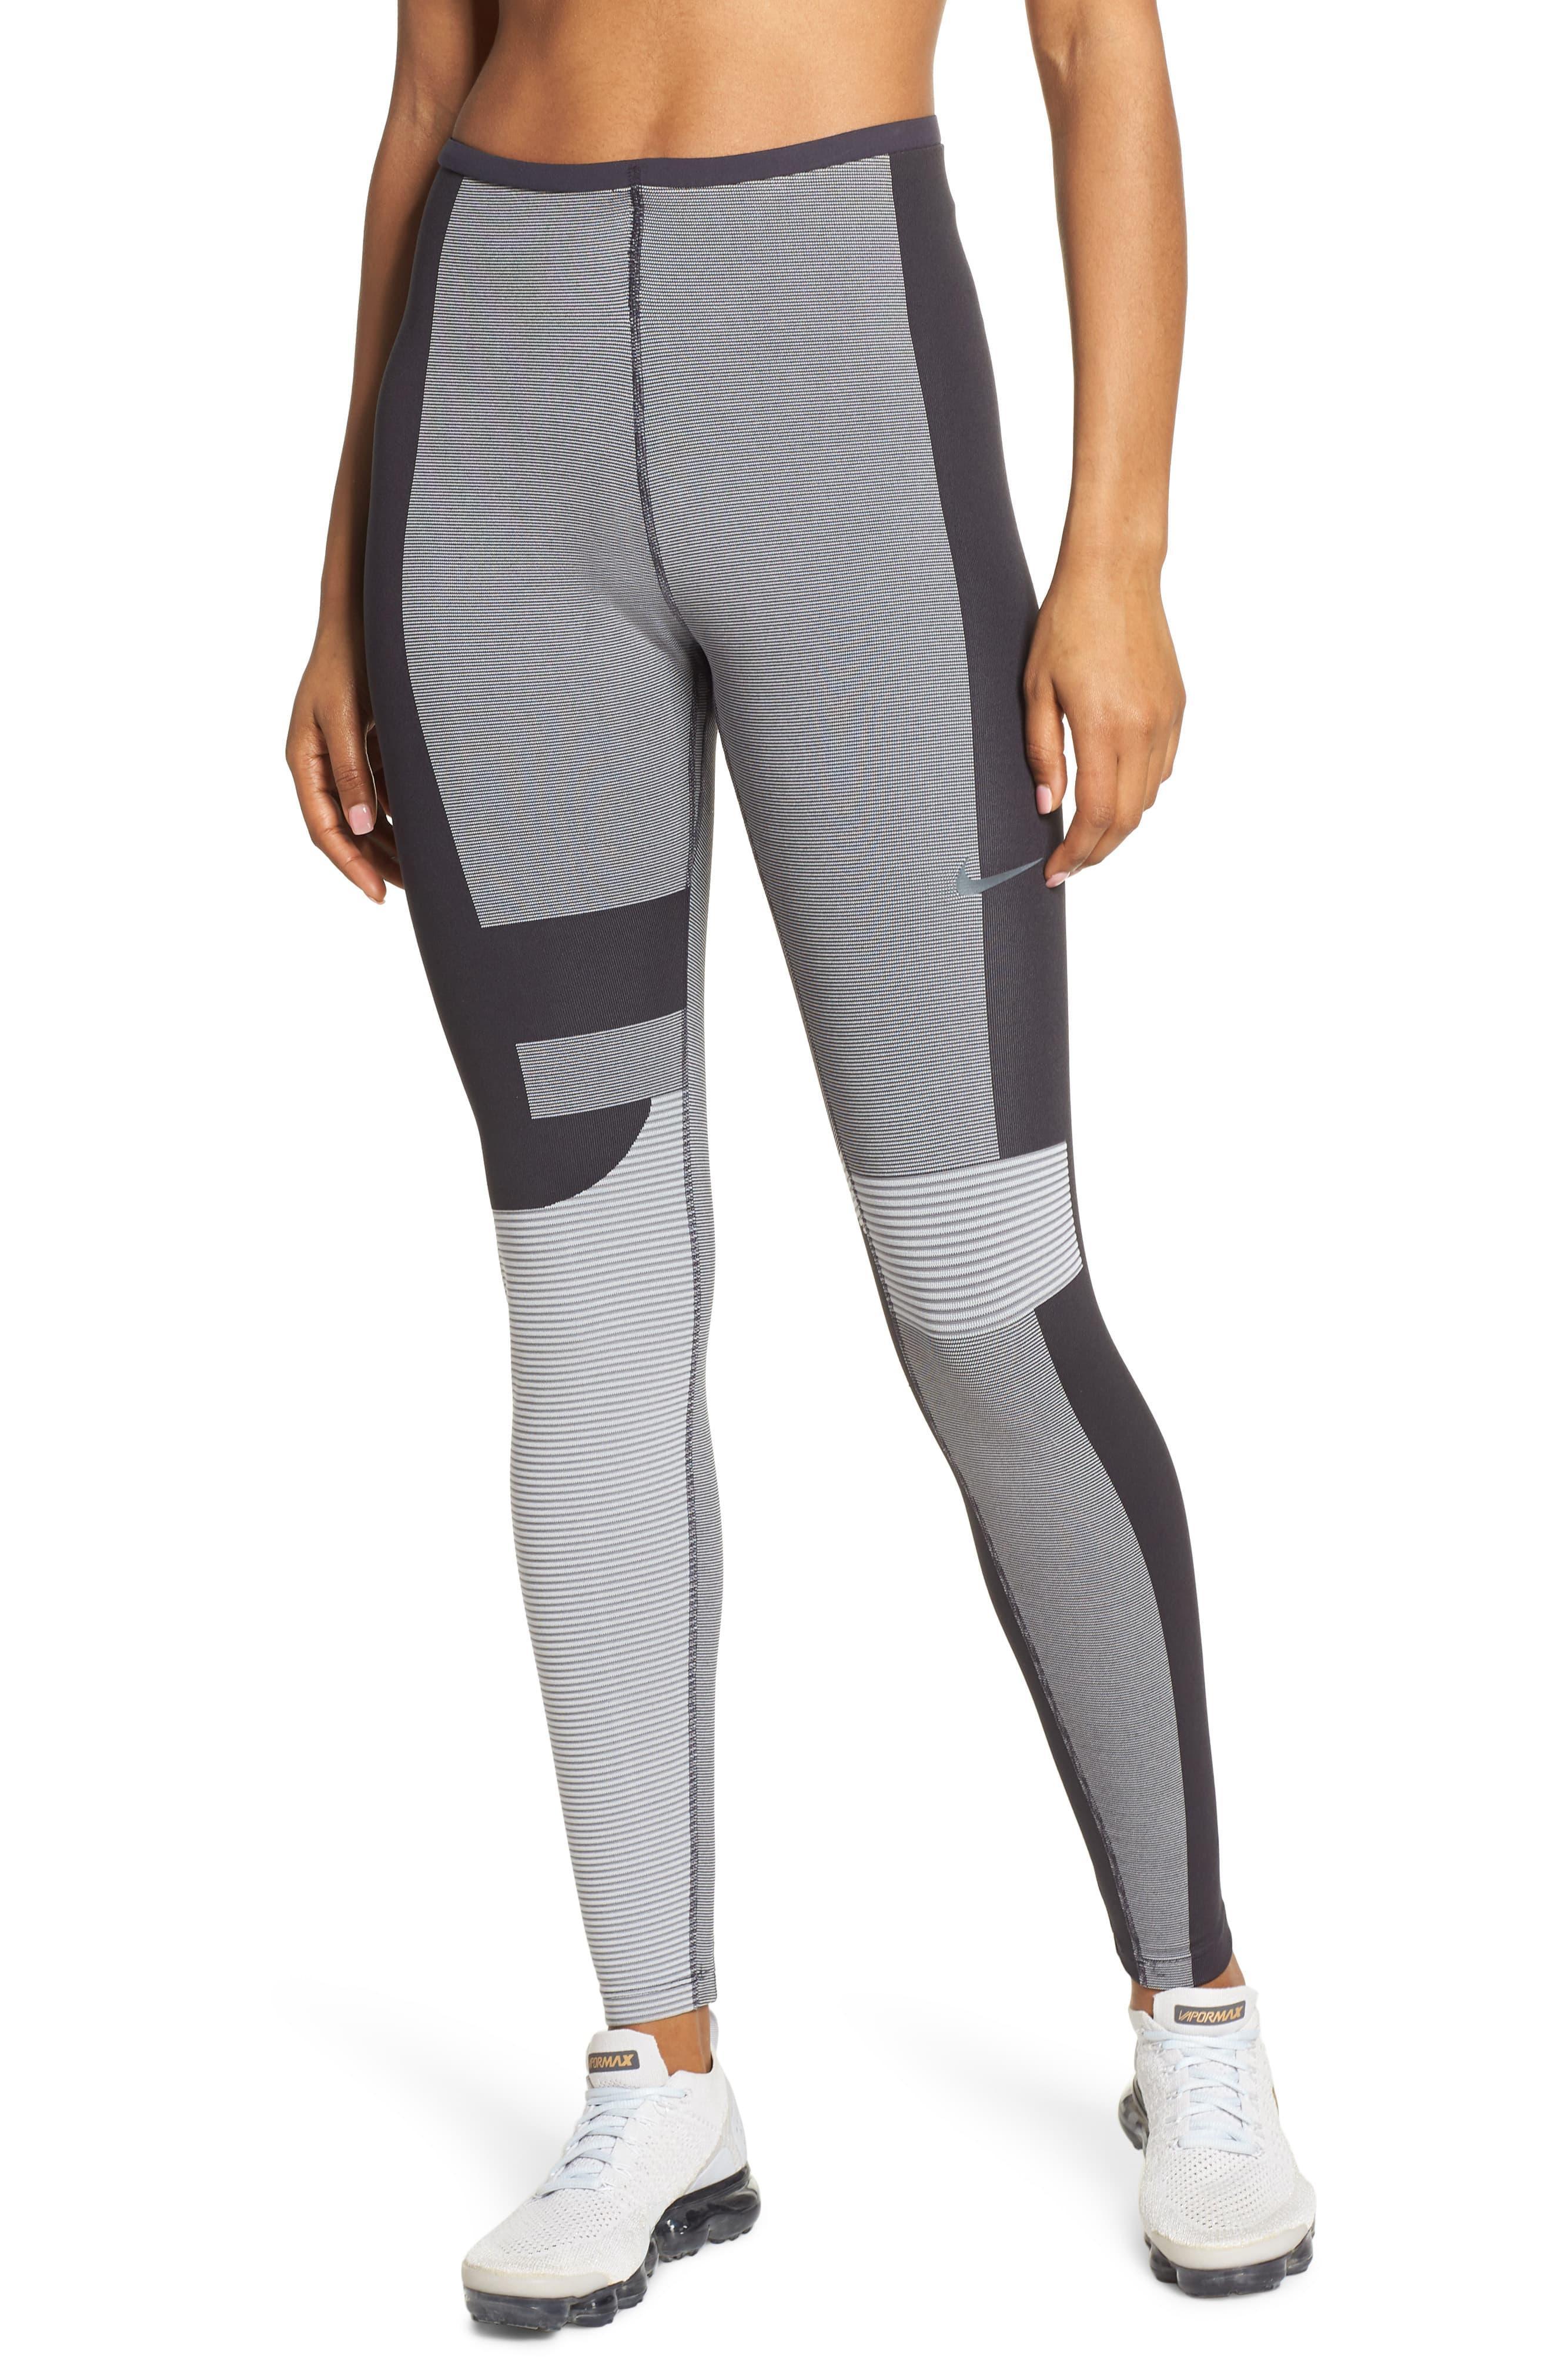 5055f71a6b0fc Nike Run Tech Pack Knit Women's Running Tights in Gray - Lyst